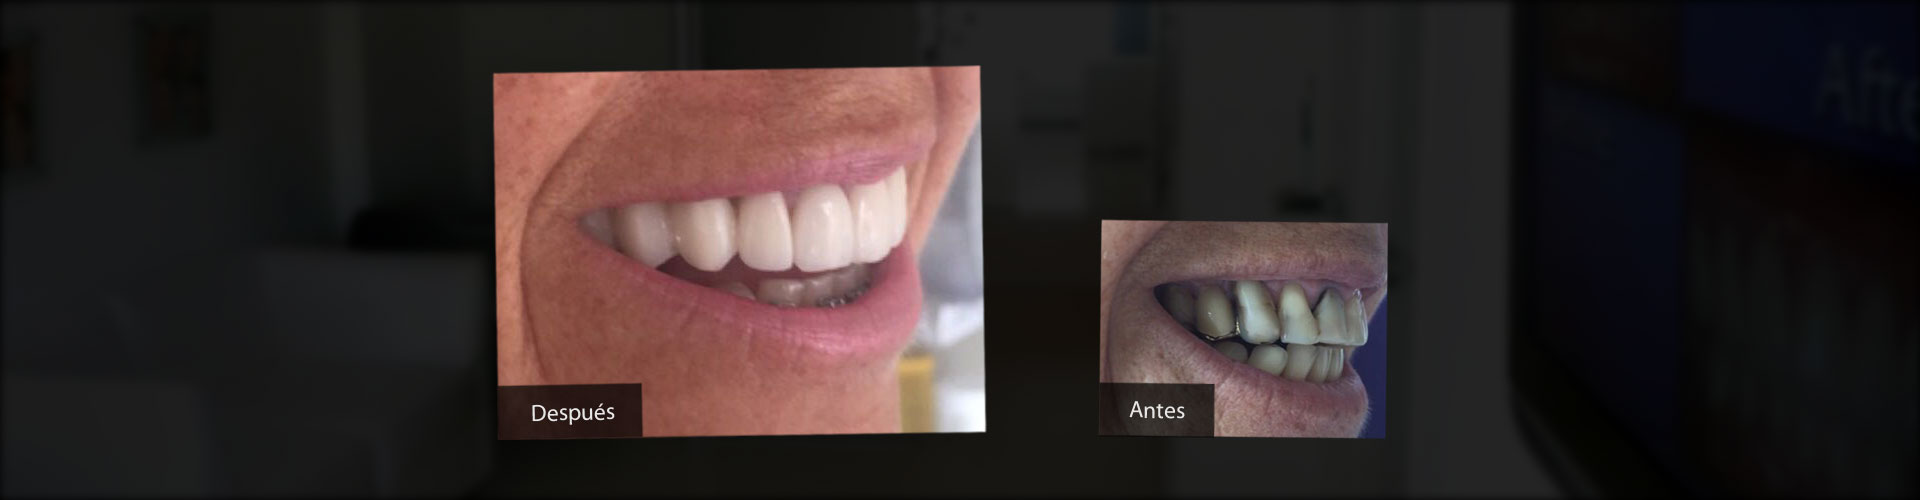 Implantes Dentales, Estética Dental, Ortodoncia